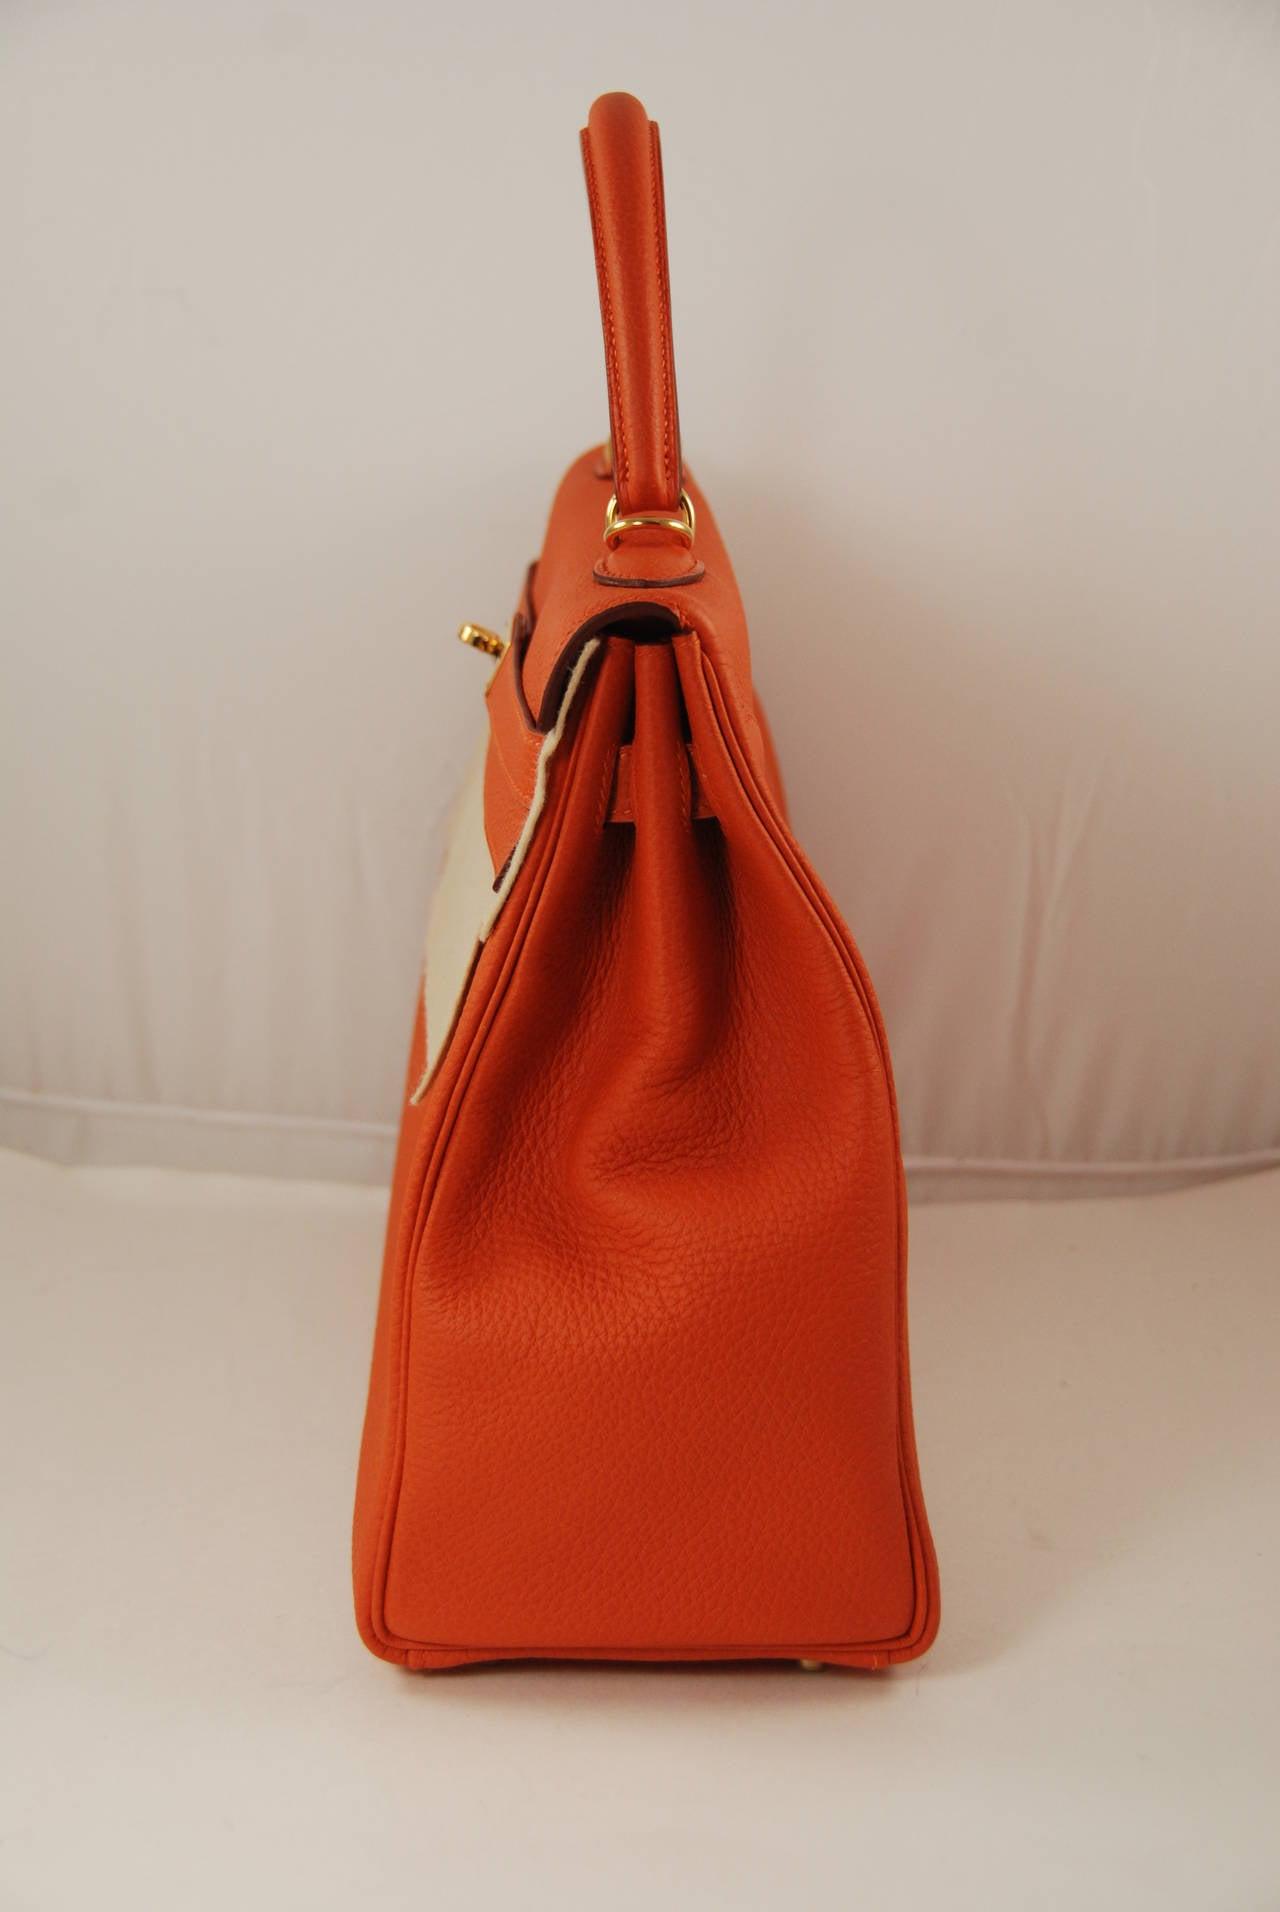 328ed26f0a 2014 Hermes 35 cm Orange Togo Leather Kelly Bag with Gold Hardware .